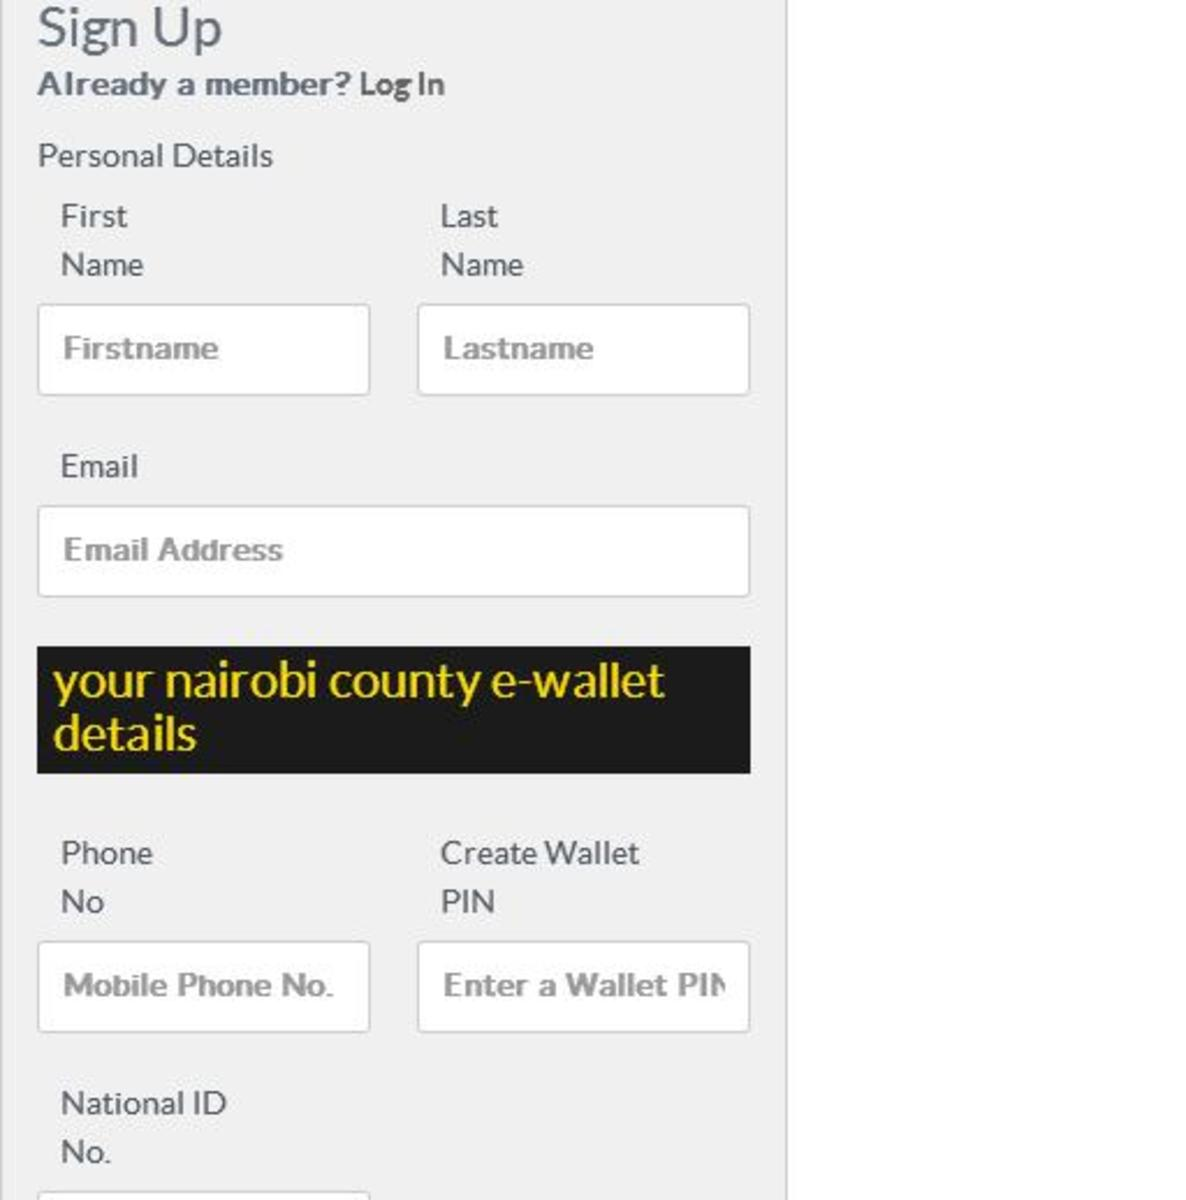 Nairobi County Licenses Renewal Online